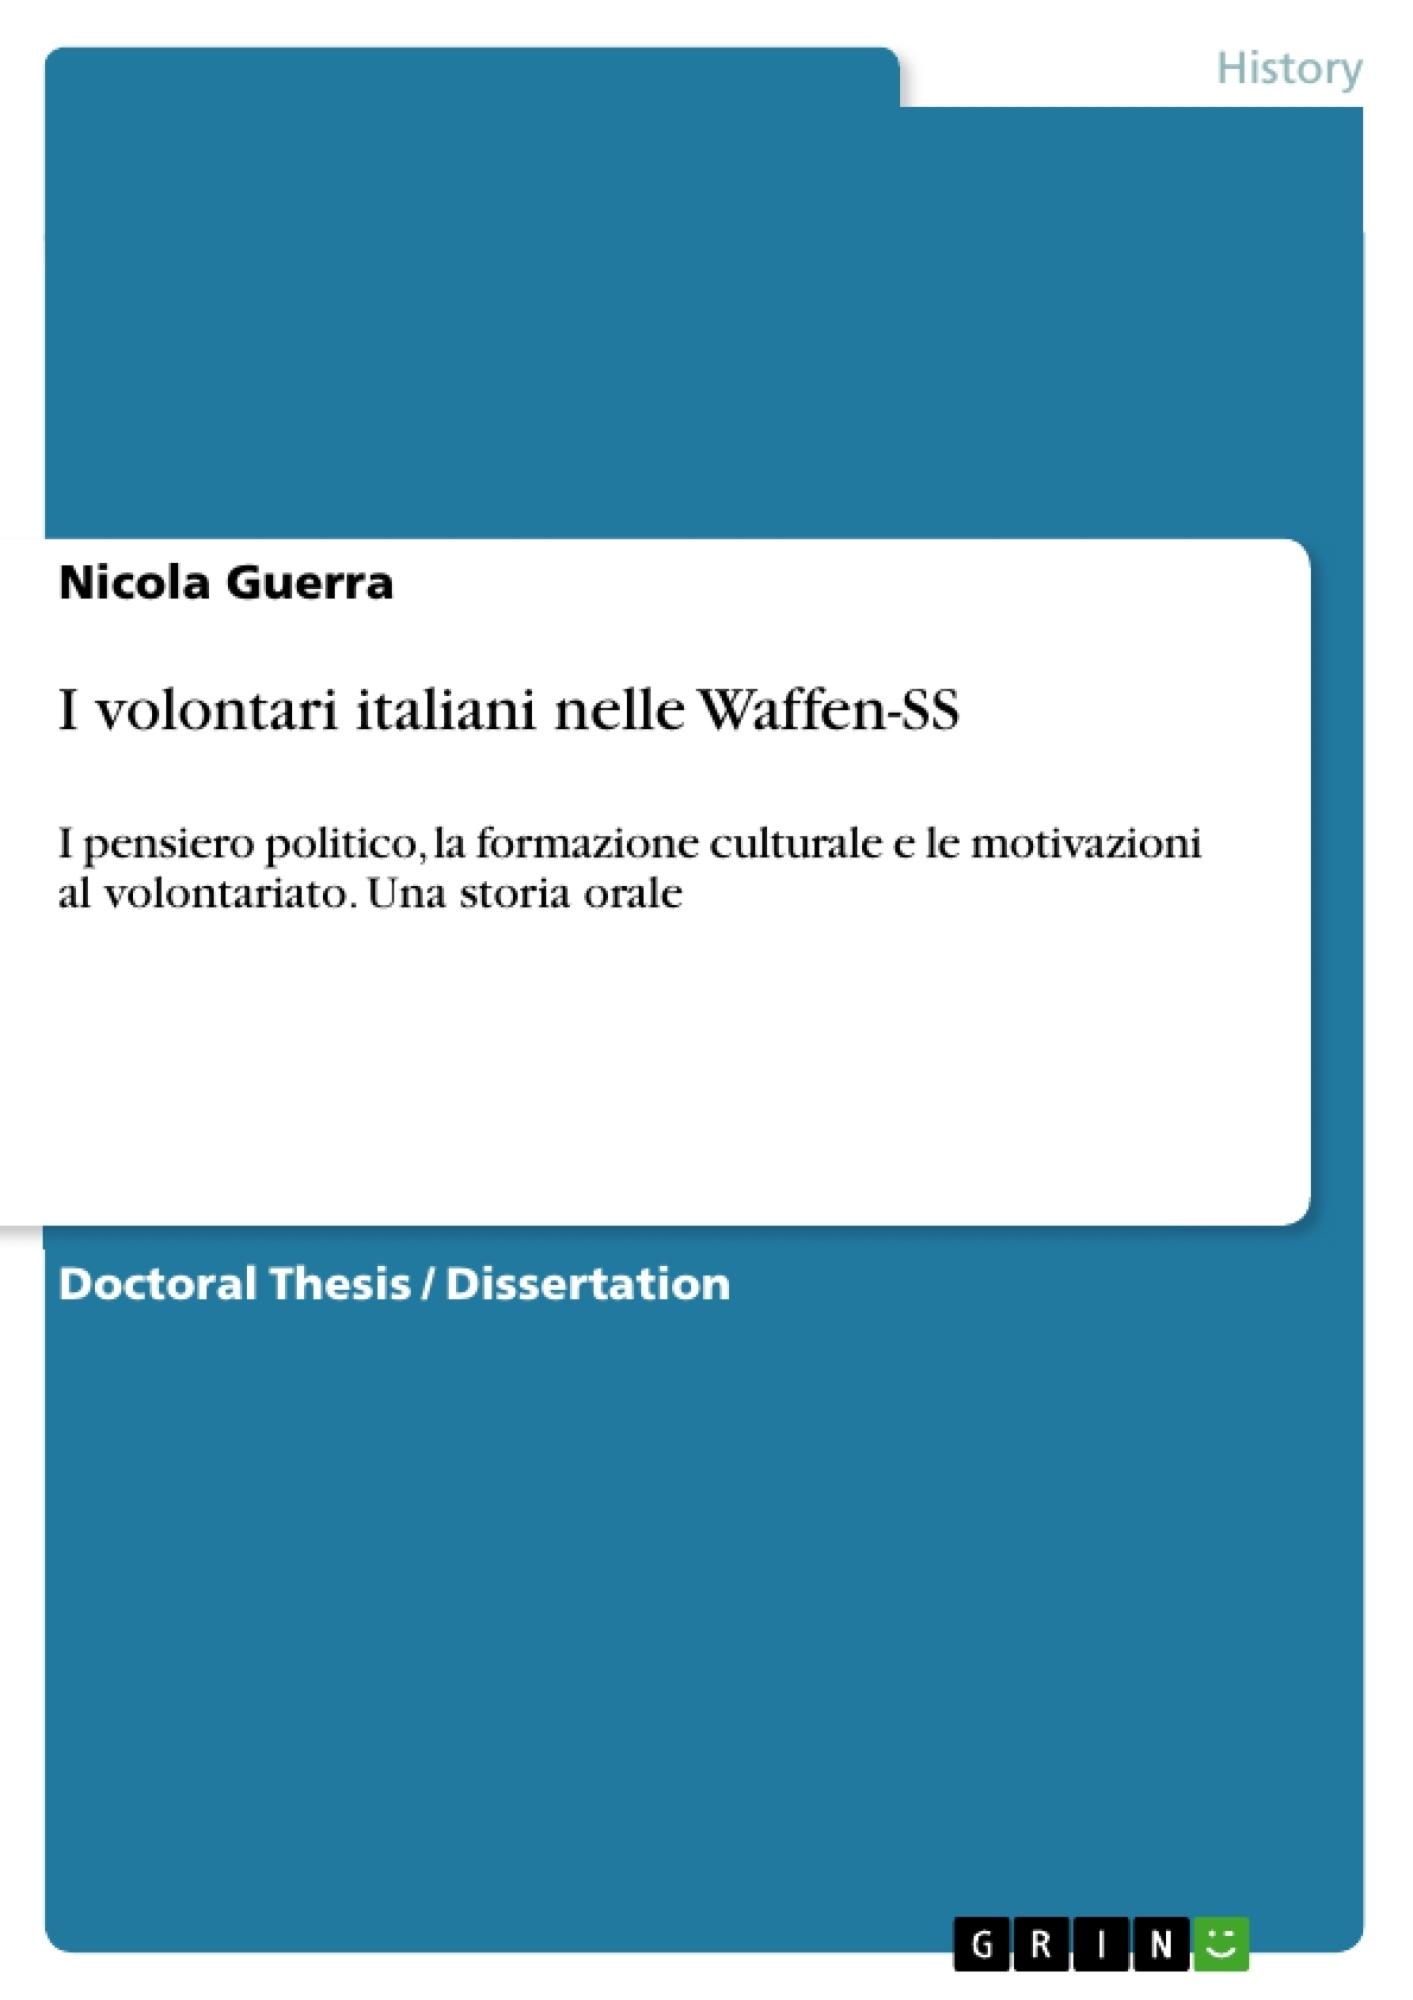 Title: I volontari italiani nelle Waffen-SS